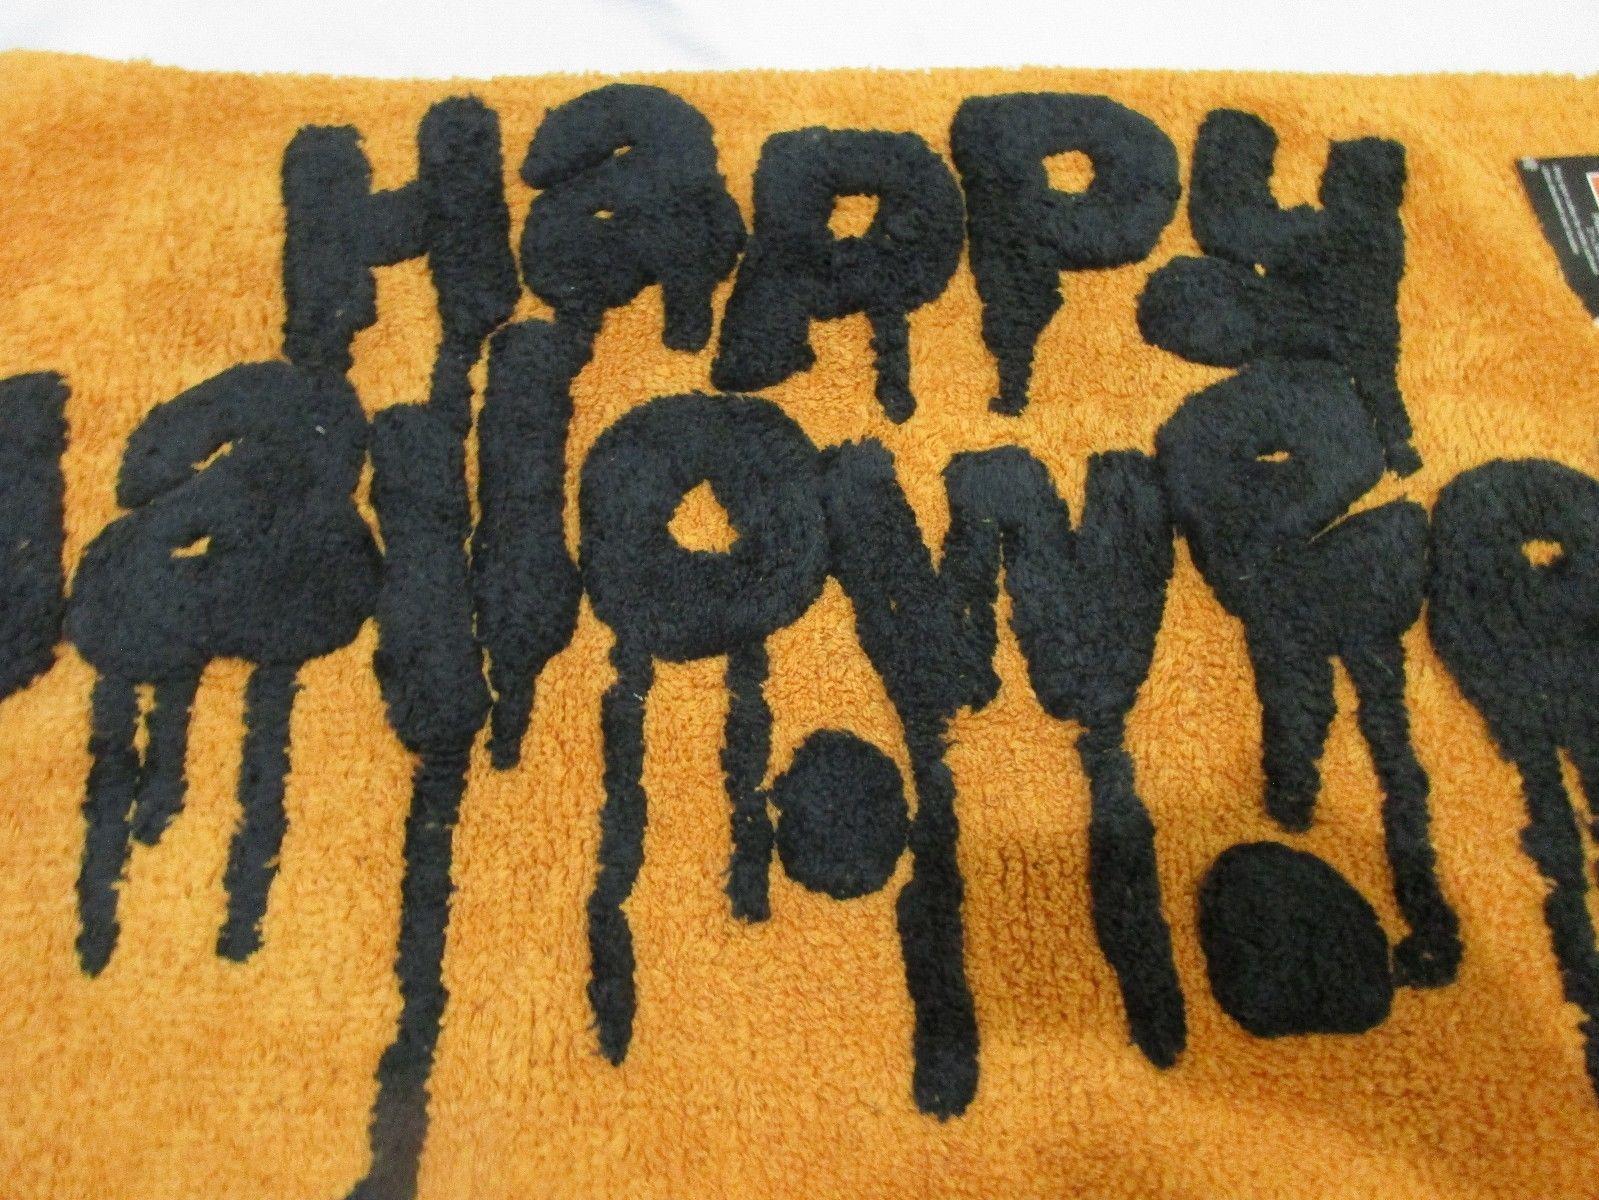 creepy happy halloween orange black bath rug kitchen throw rug 21x34 nwt